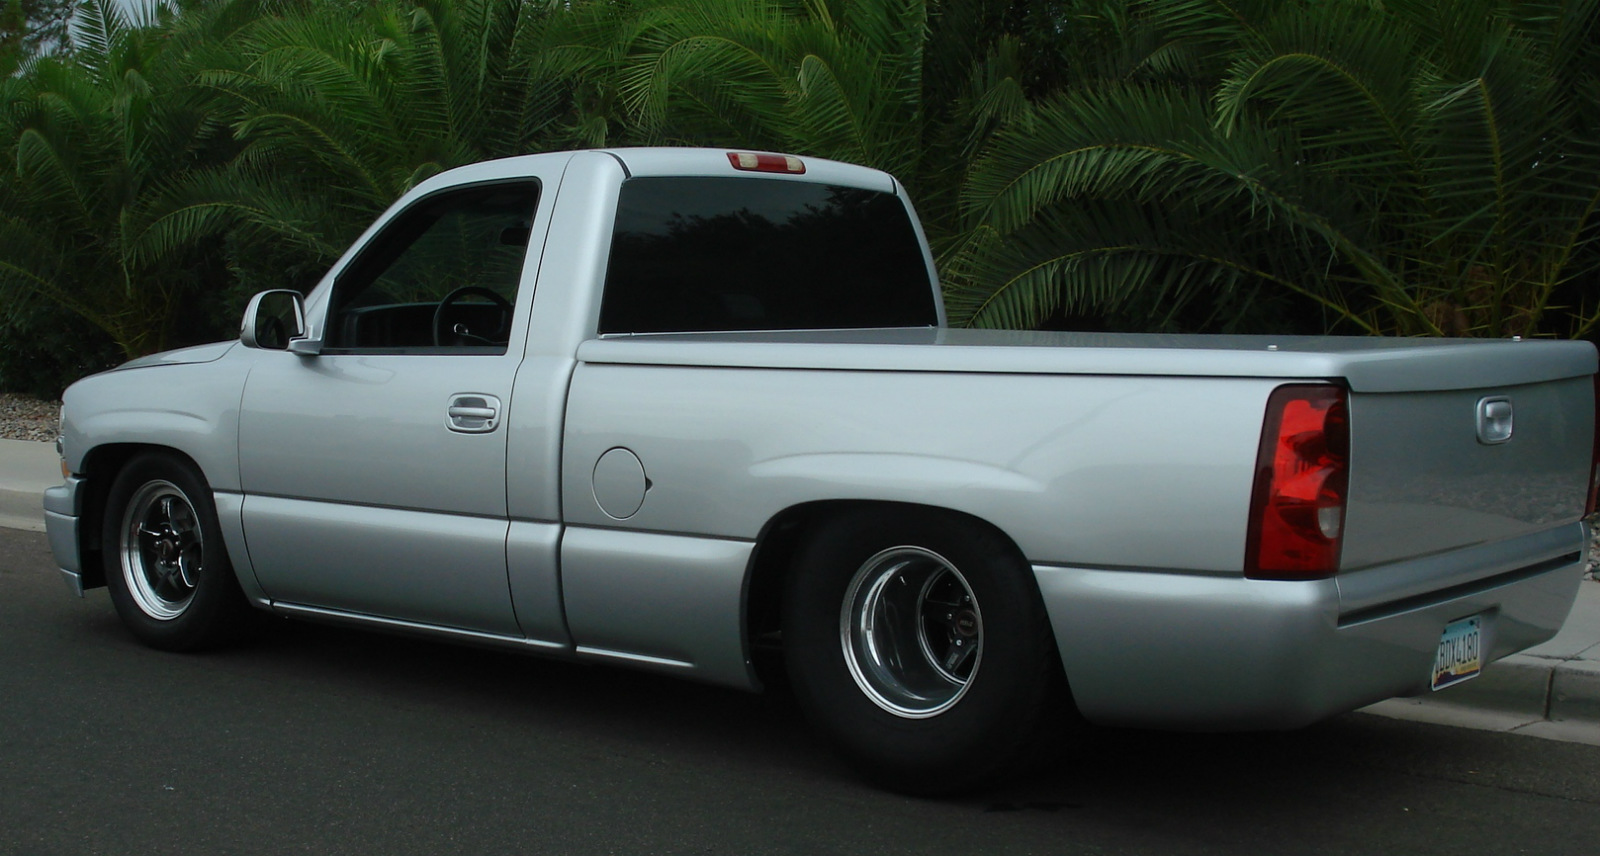 BangShift.com eBay Find: A Ready-To-Go 2001 Chevrolet Silverado ...